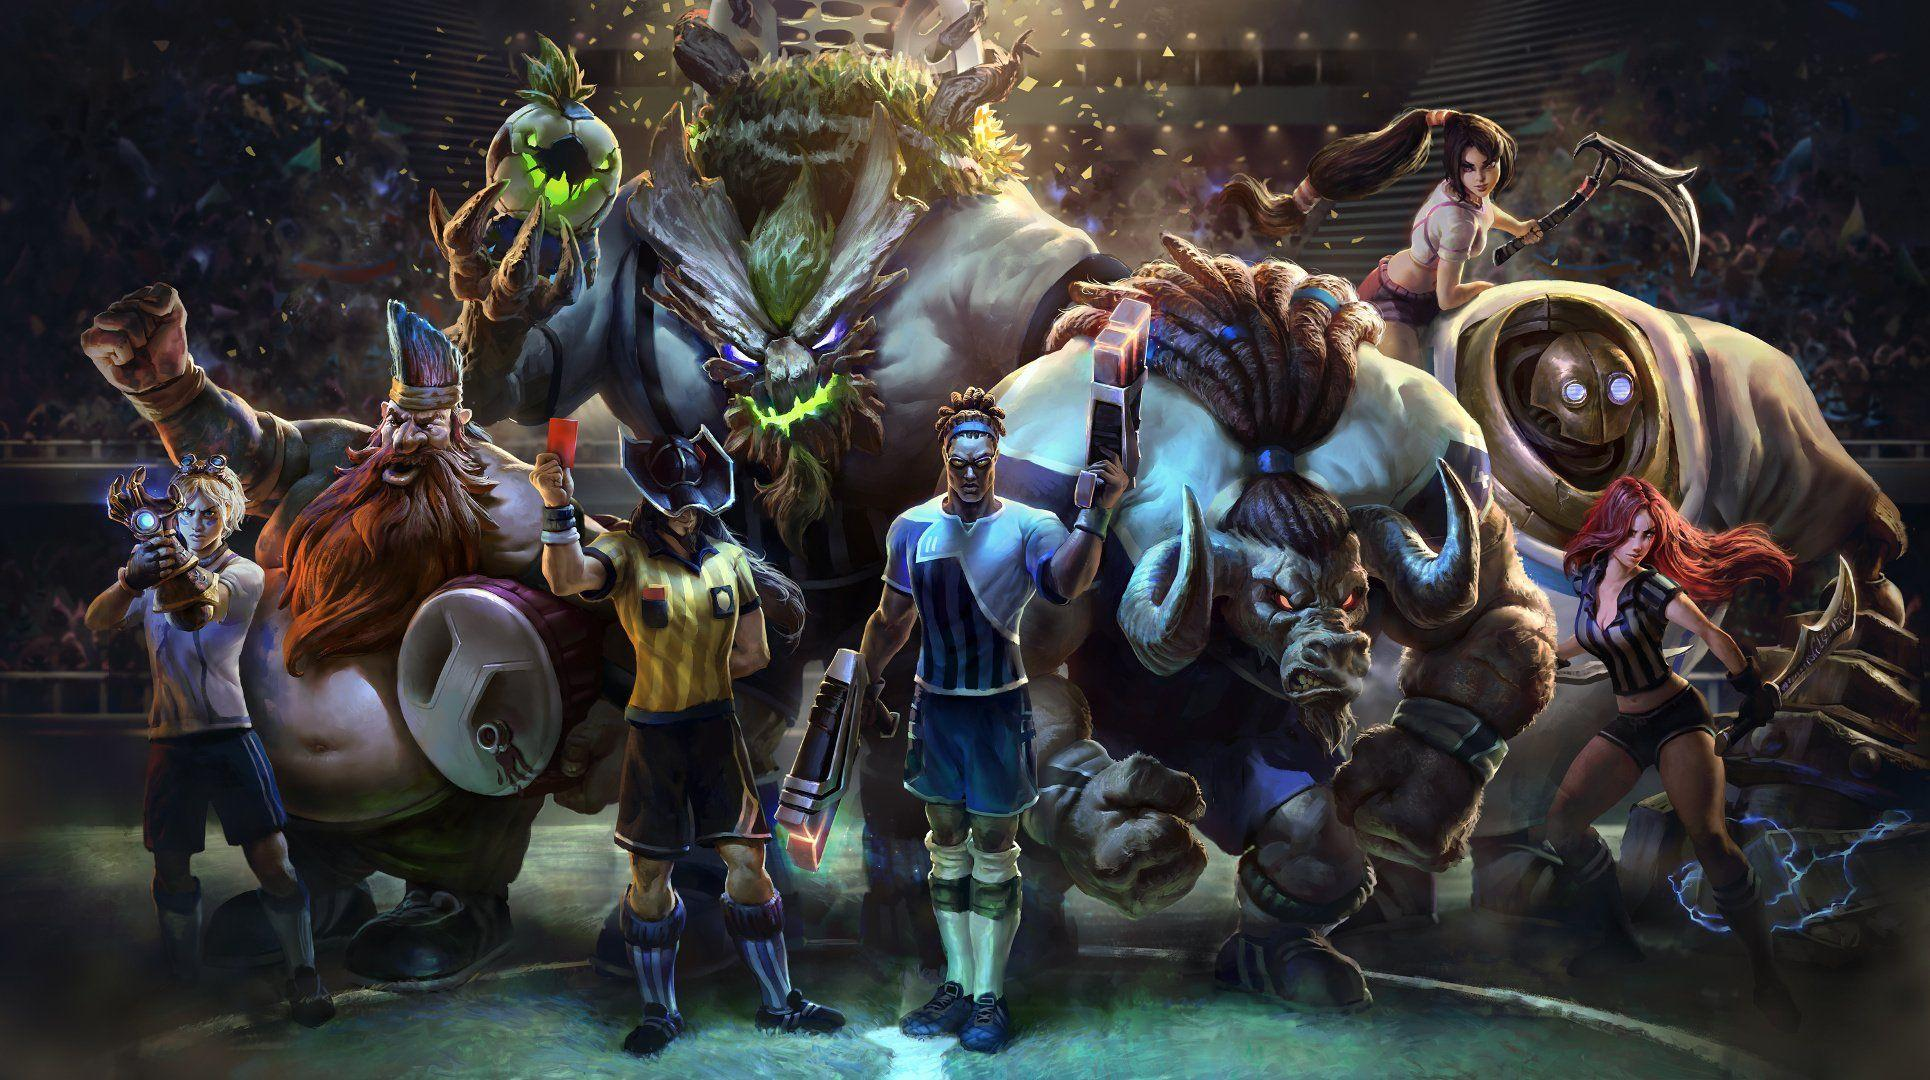 League Of Legends Wallpapers 1080p Wallpaper Cave